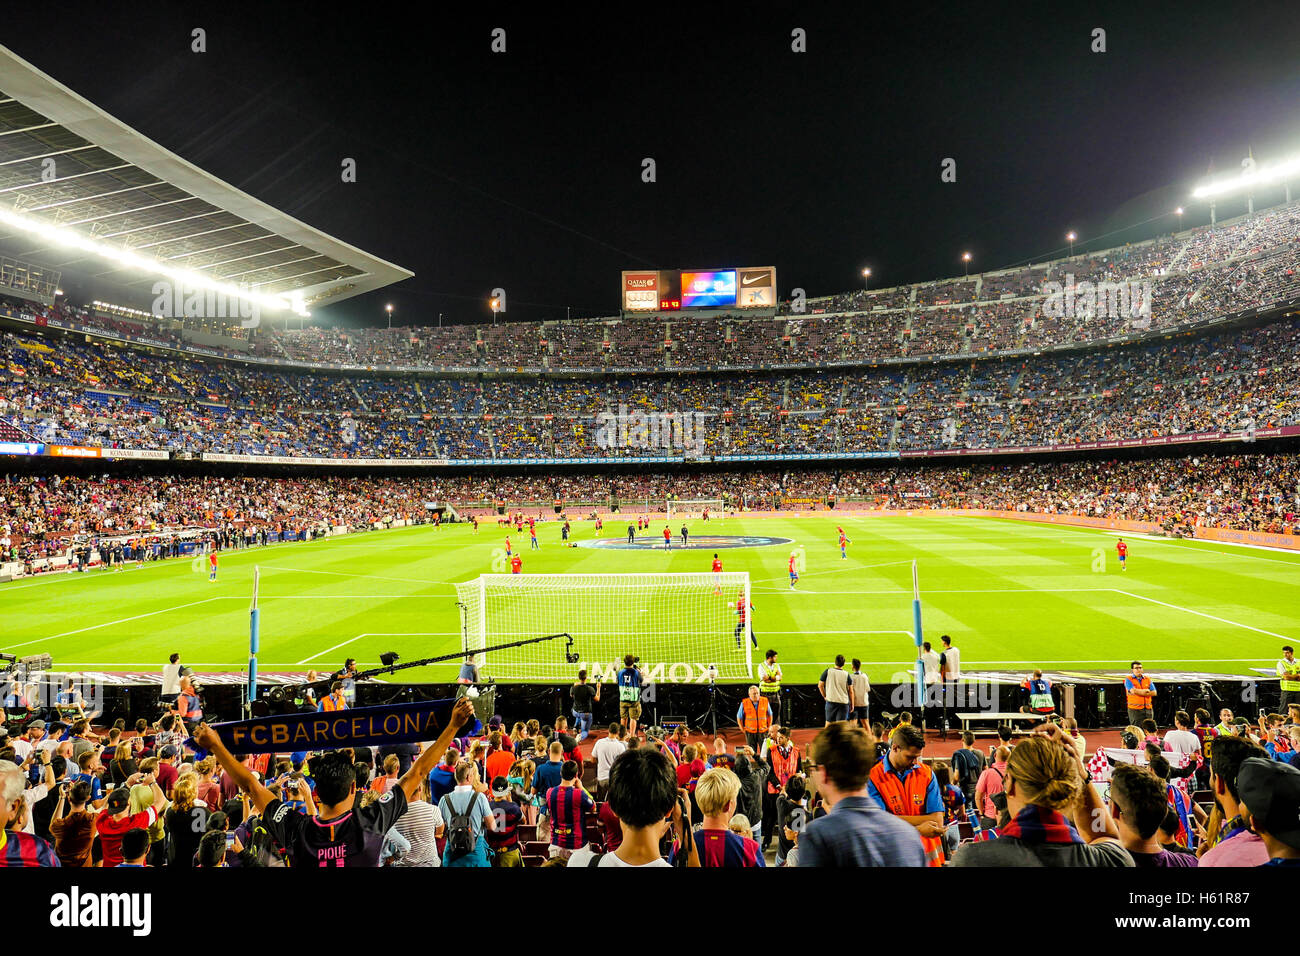 Barcelona, Nou Camp, football stadium, Spain - Stock Image